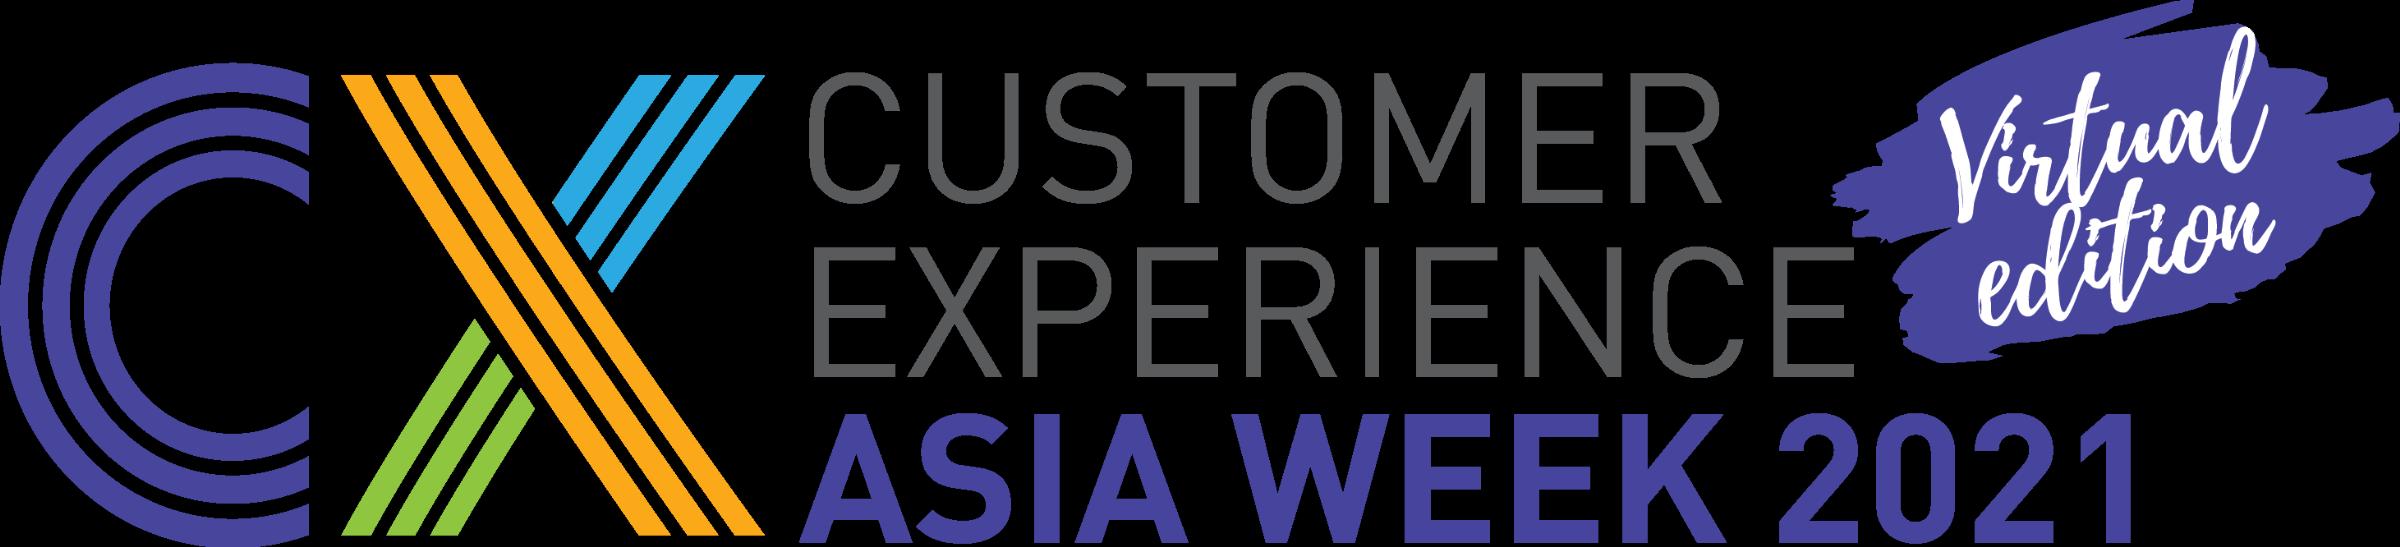 CX Asia Week 2021 - Virtual Edition